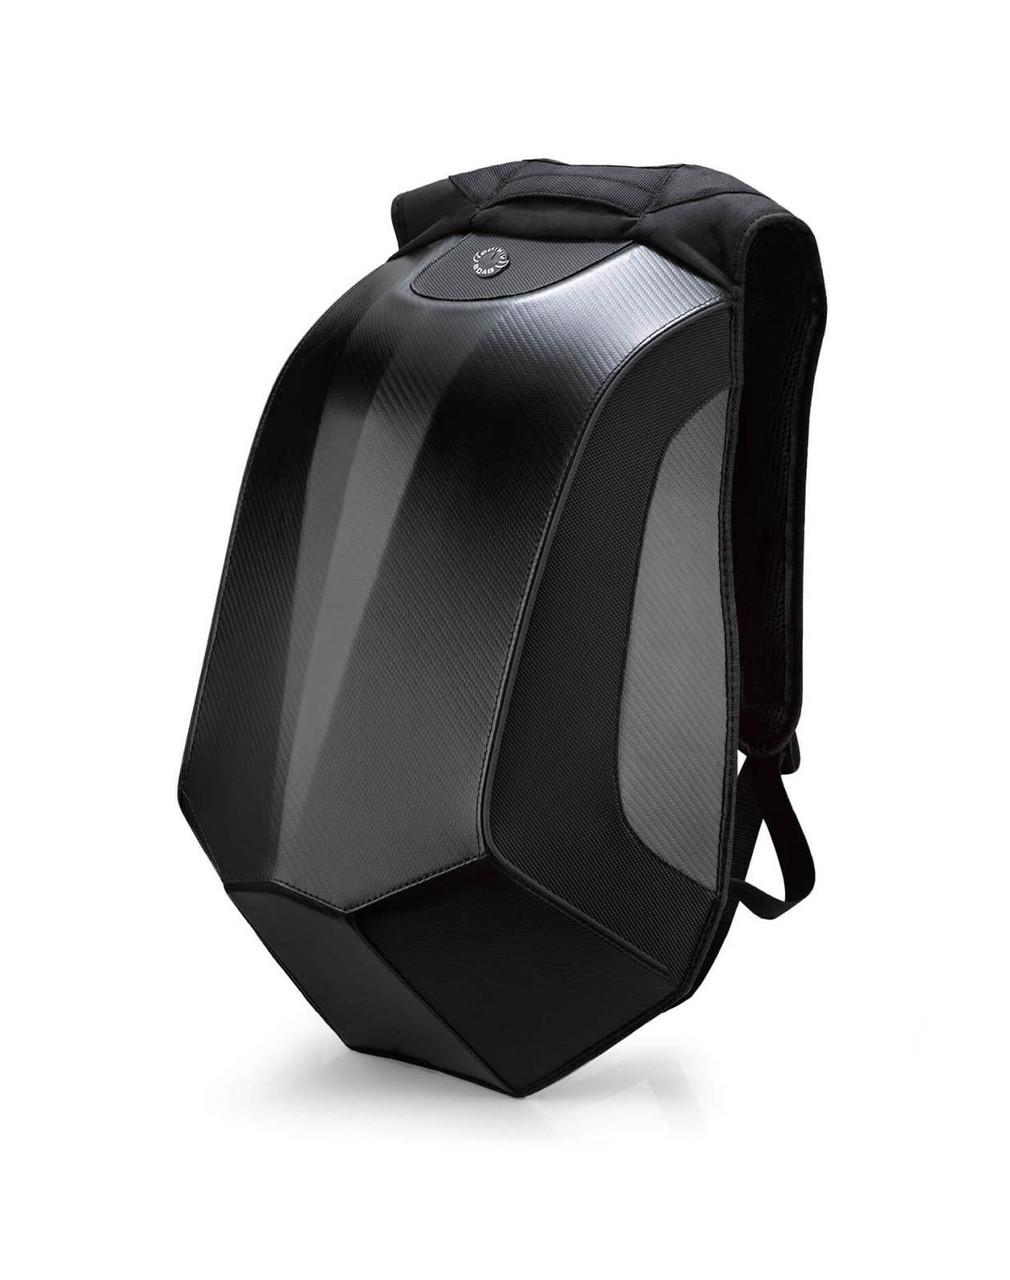 VikingBags Velocity Large Black Expandable Honda Motorcycle Backpack Main Bag View